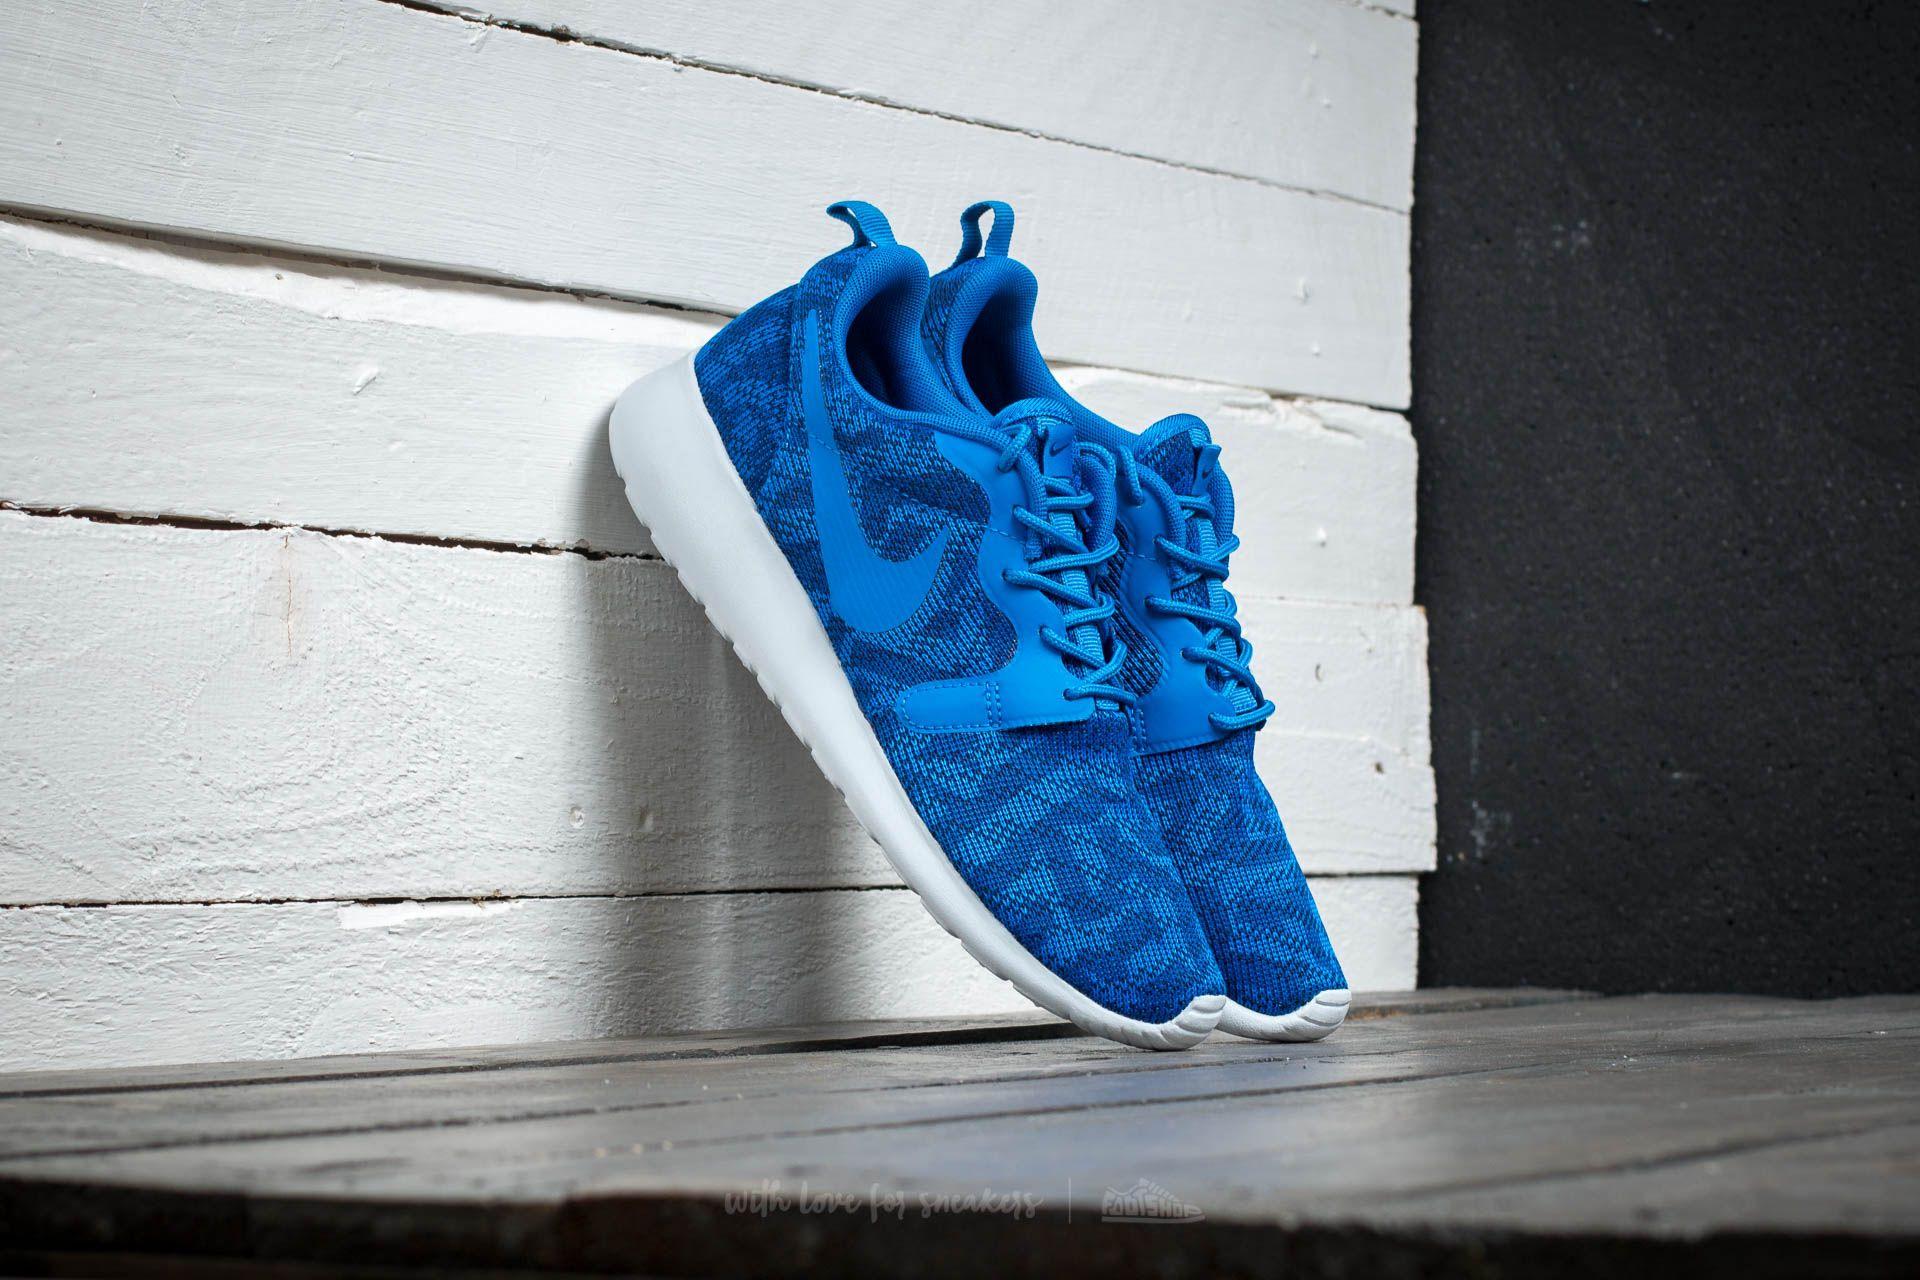 a7d6c3e6bf4a2 Nike Wmns Roshe One KJCRD Deep Royal Blue  Soar- Platinum ...